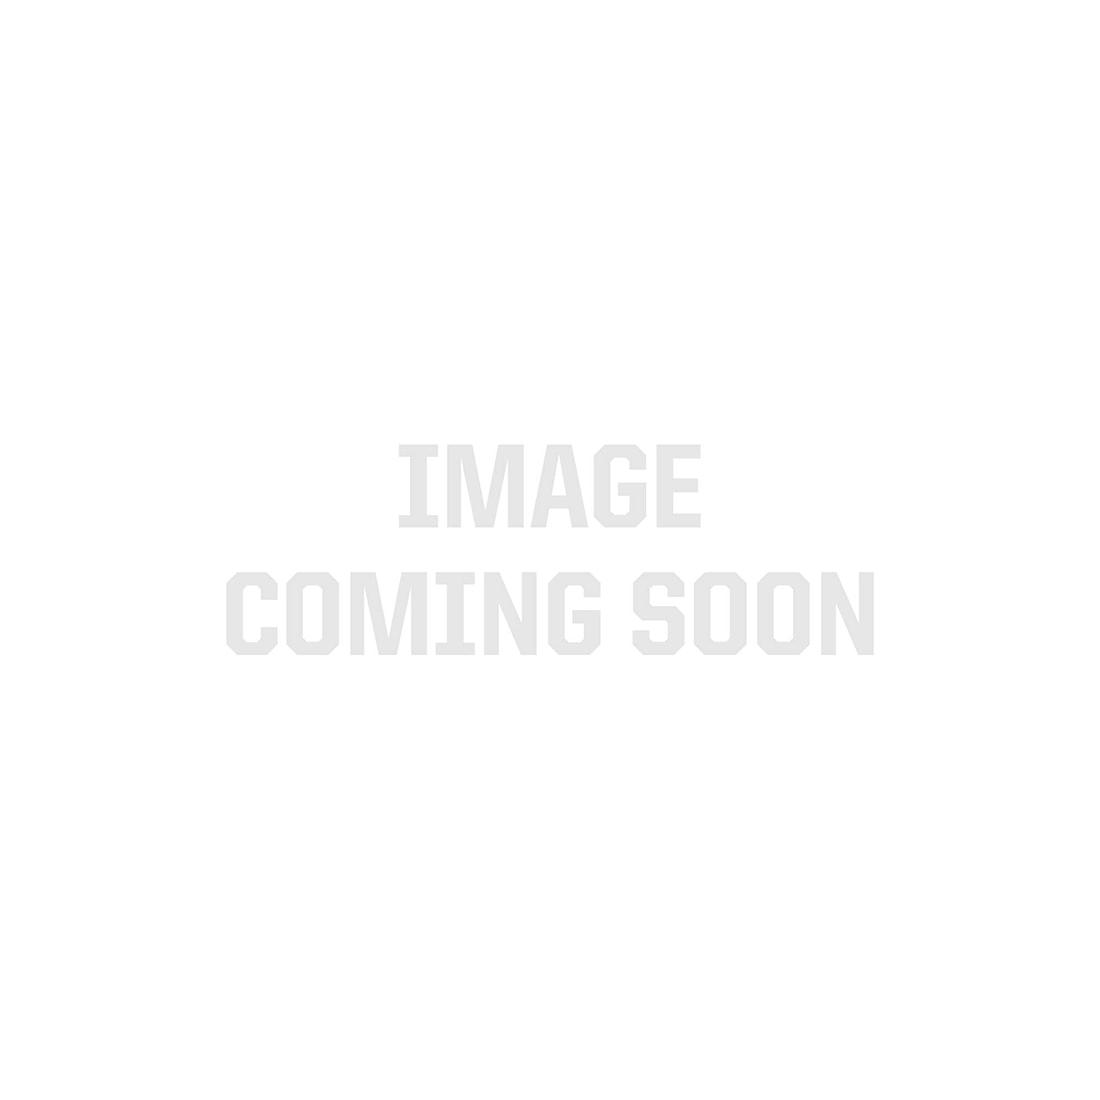 Frosted SZER Cover for Klus SEPOD, SEKOMA, SEKODU Aluminum Channel